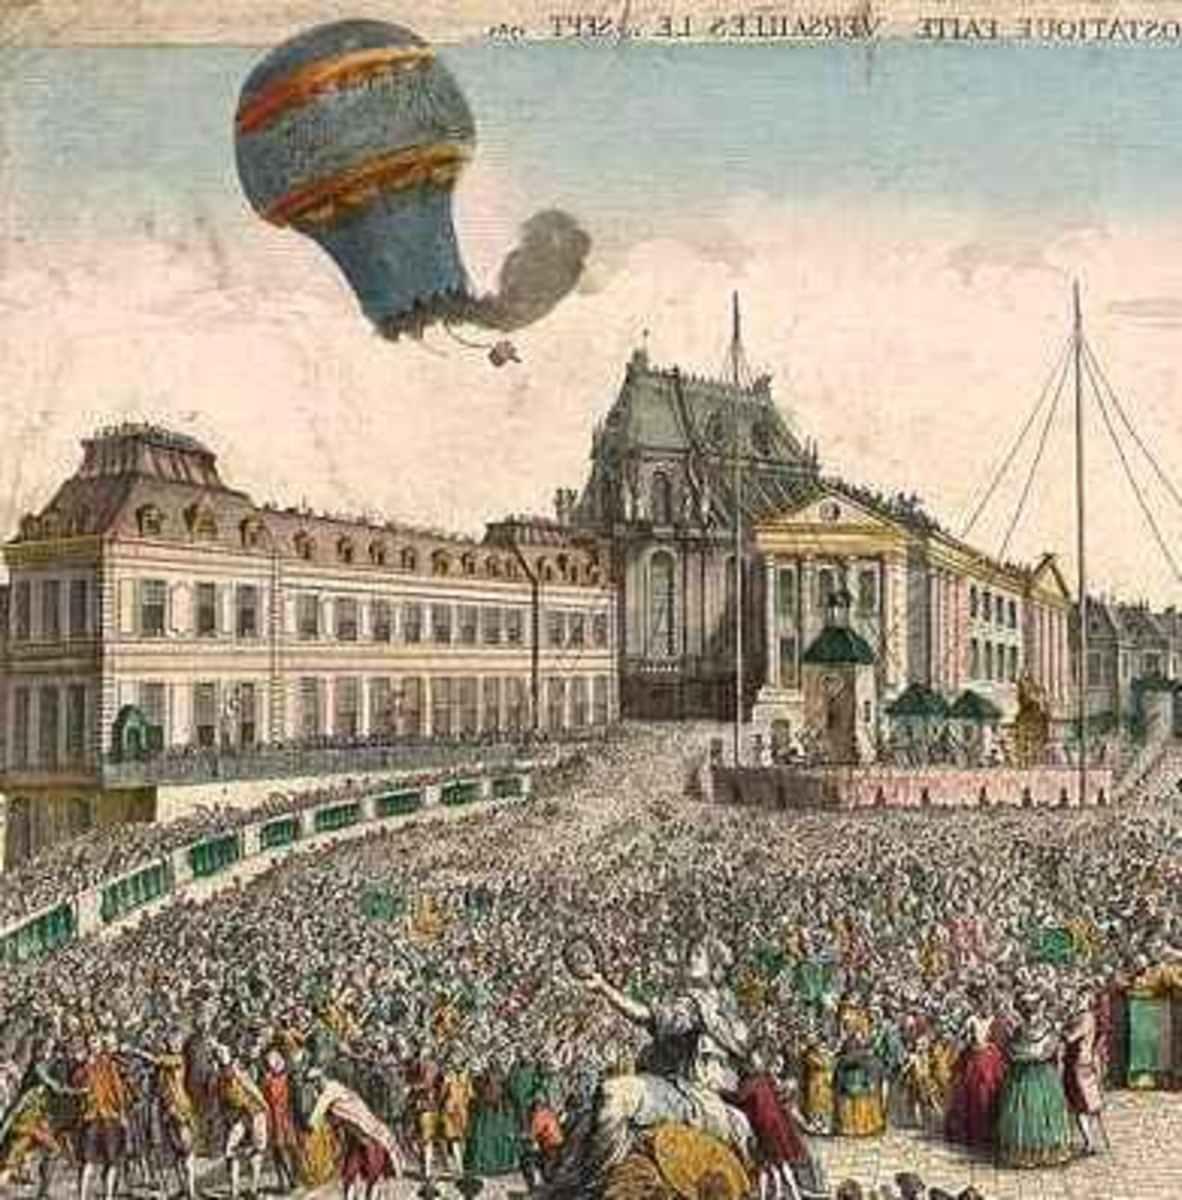 Montgolfier brothers balloon flight Paris street scene